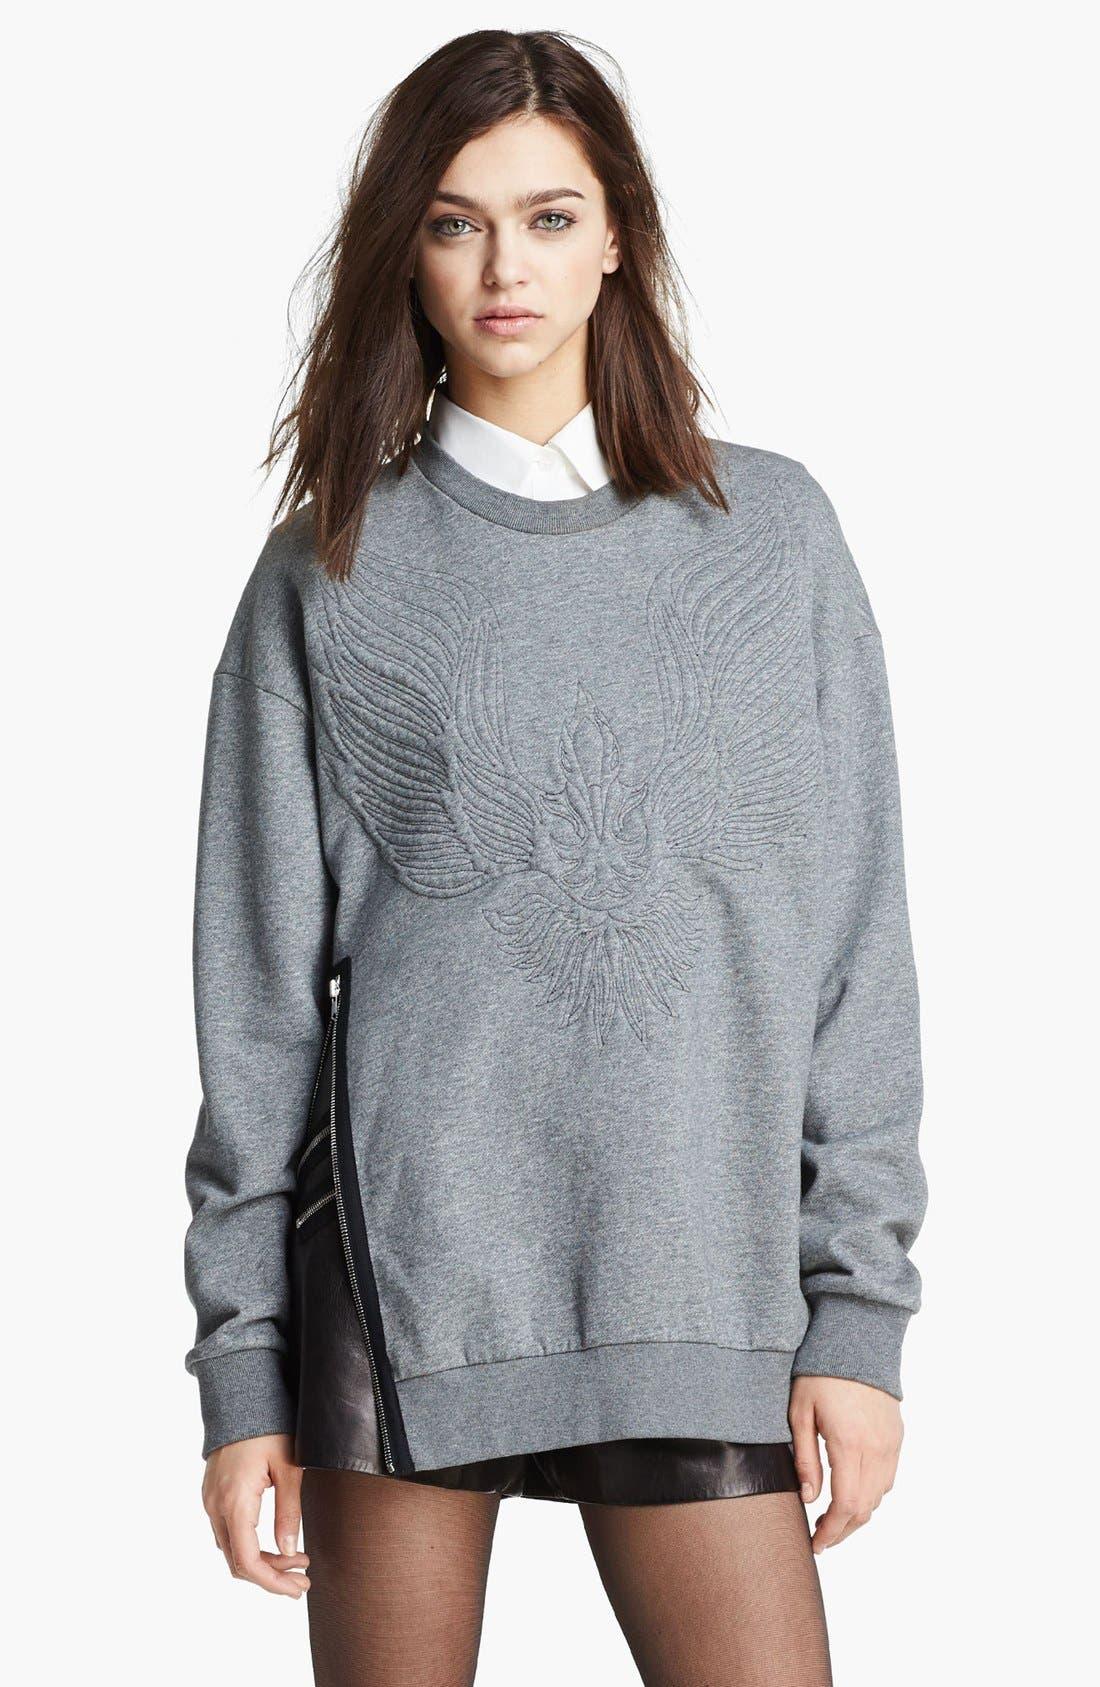 Main Image - 3.1 Phillip Lim Quilted Phoenix Oversized Sweatshirt